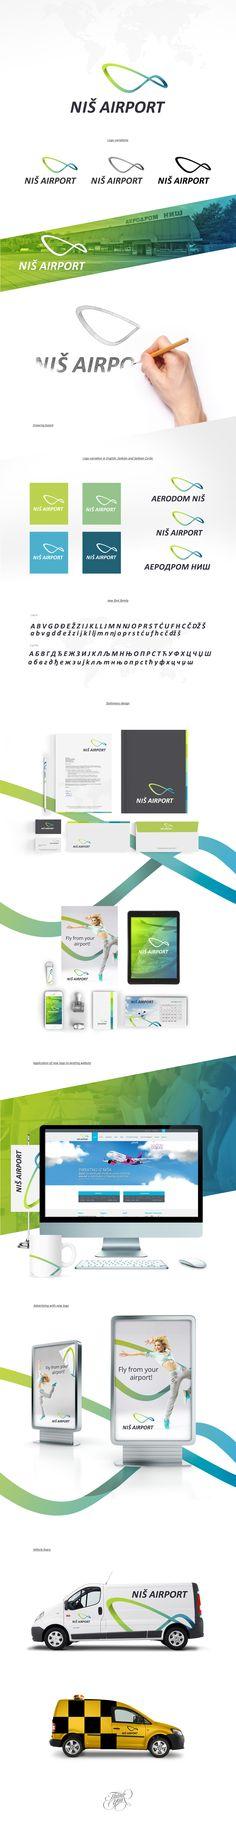 Brand Identity | Niš Airport on Behance